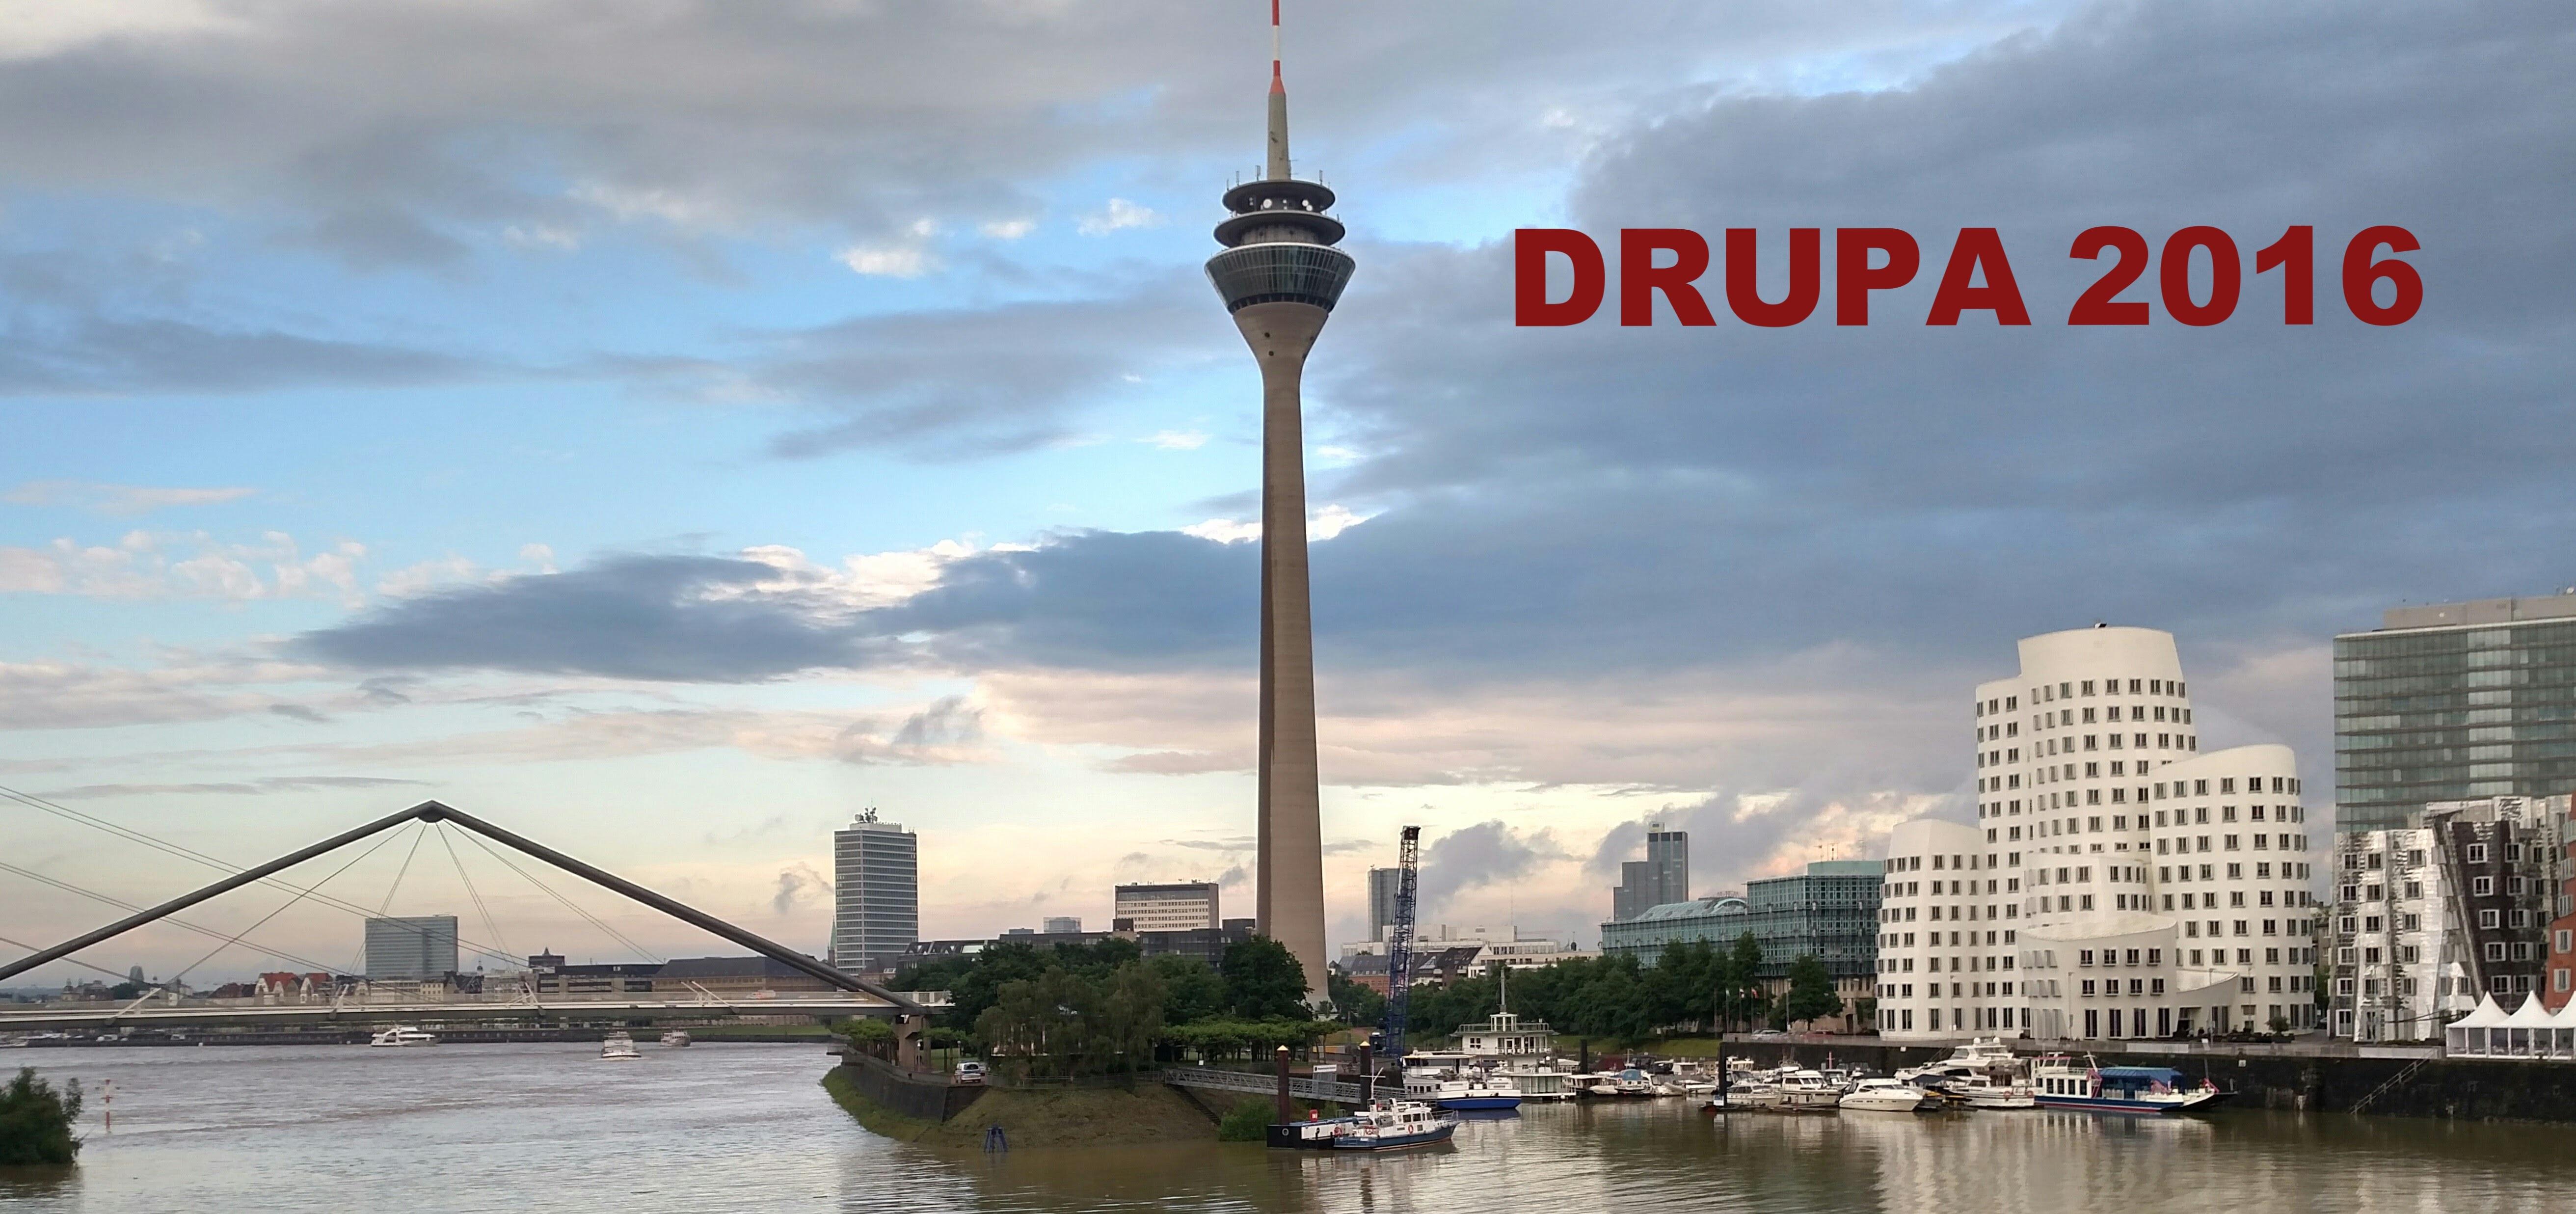 Drupa_2016-529444-edited.jpg